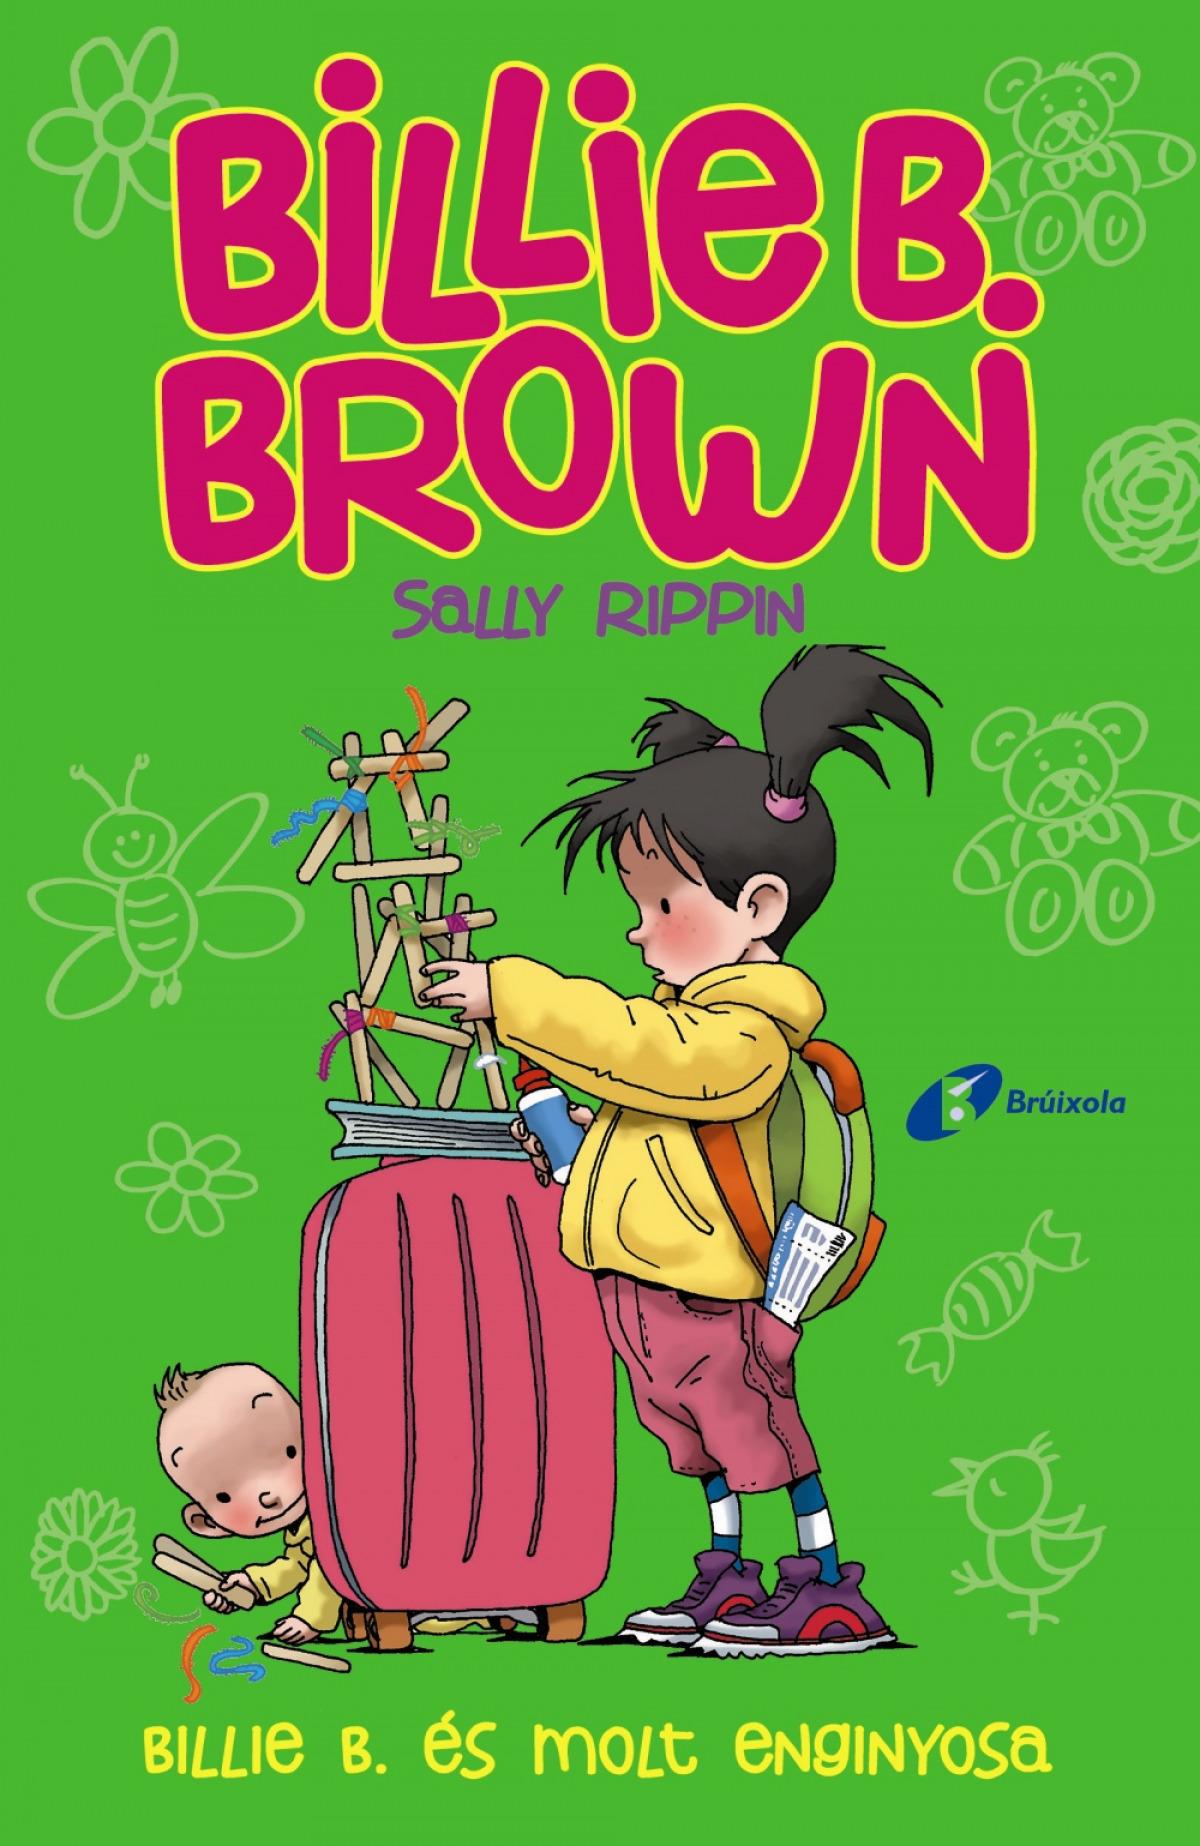 Billie B. Brown, 6. Billie B. és molt enginyosa